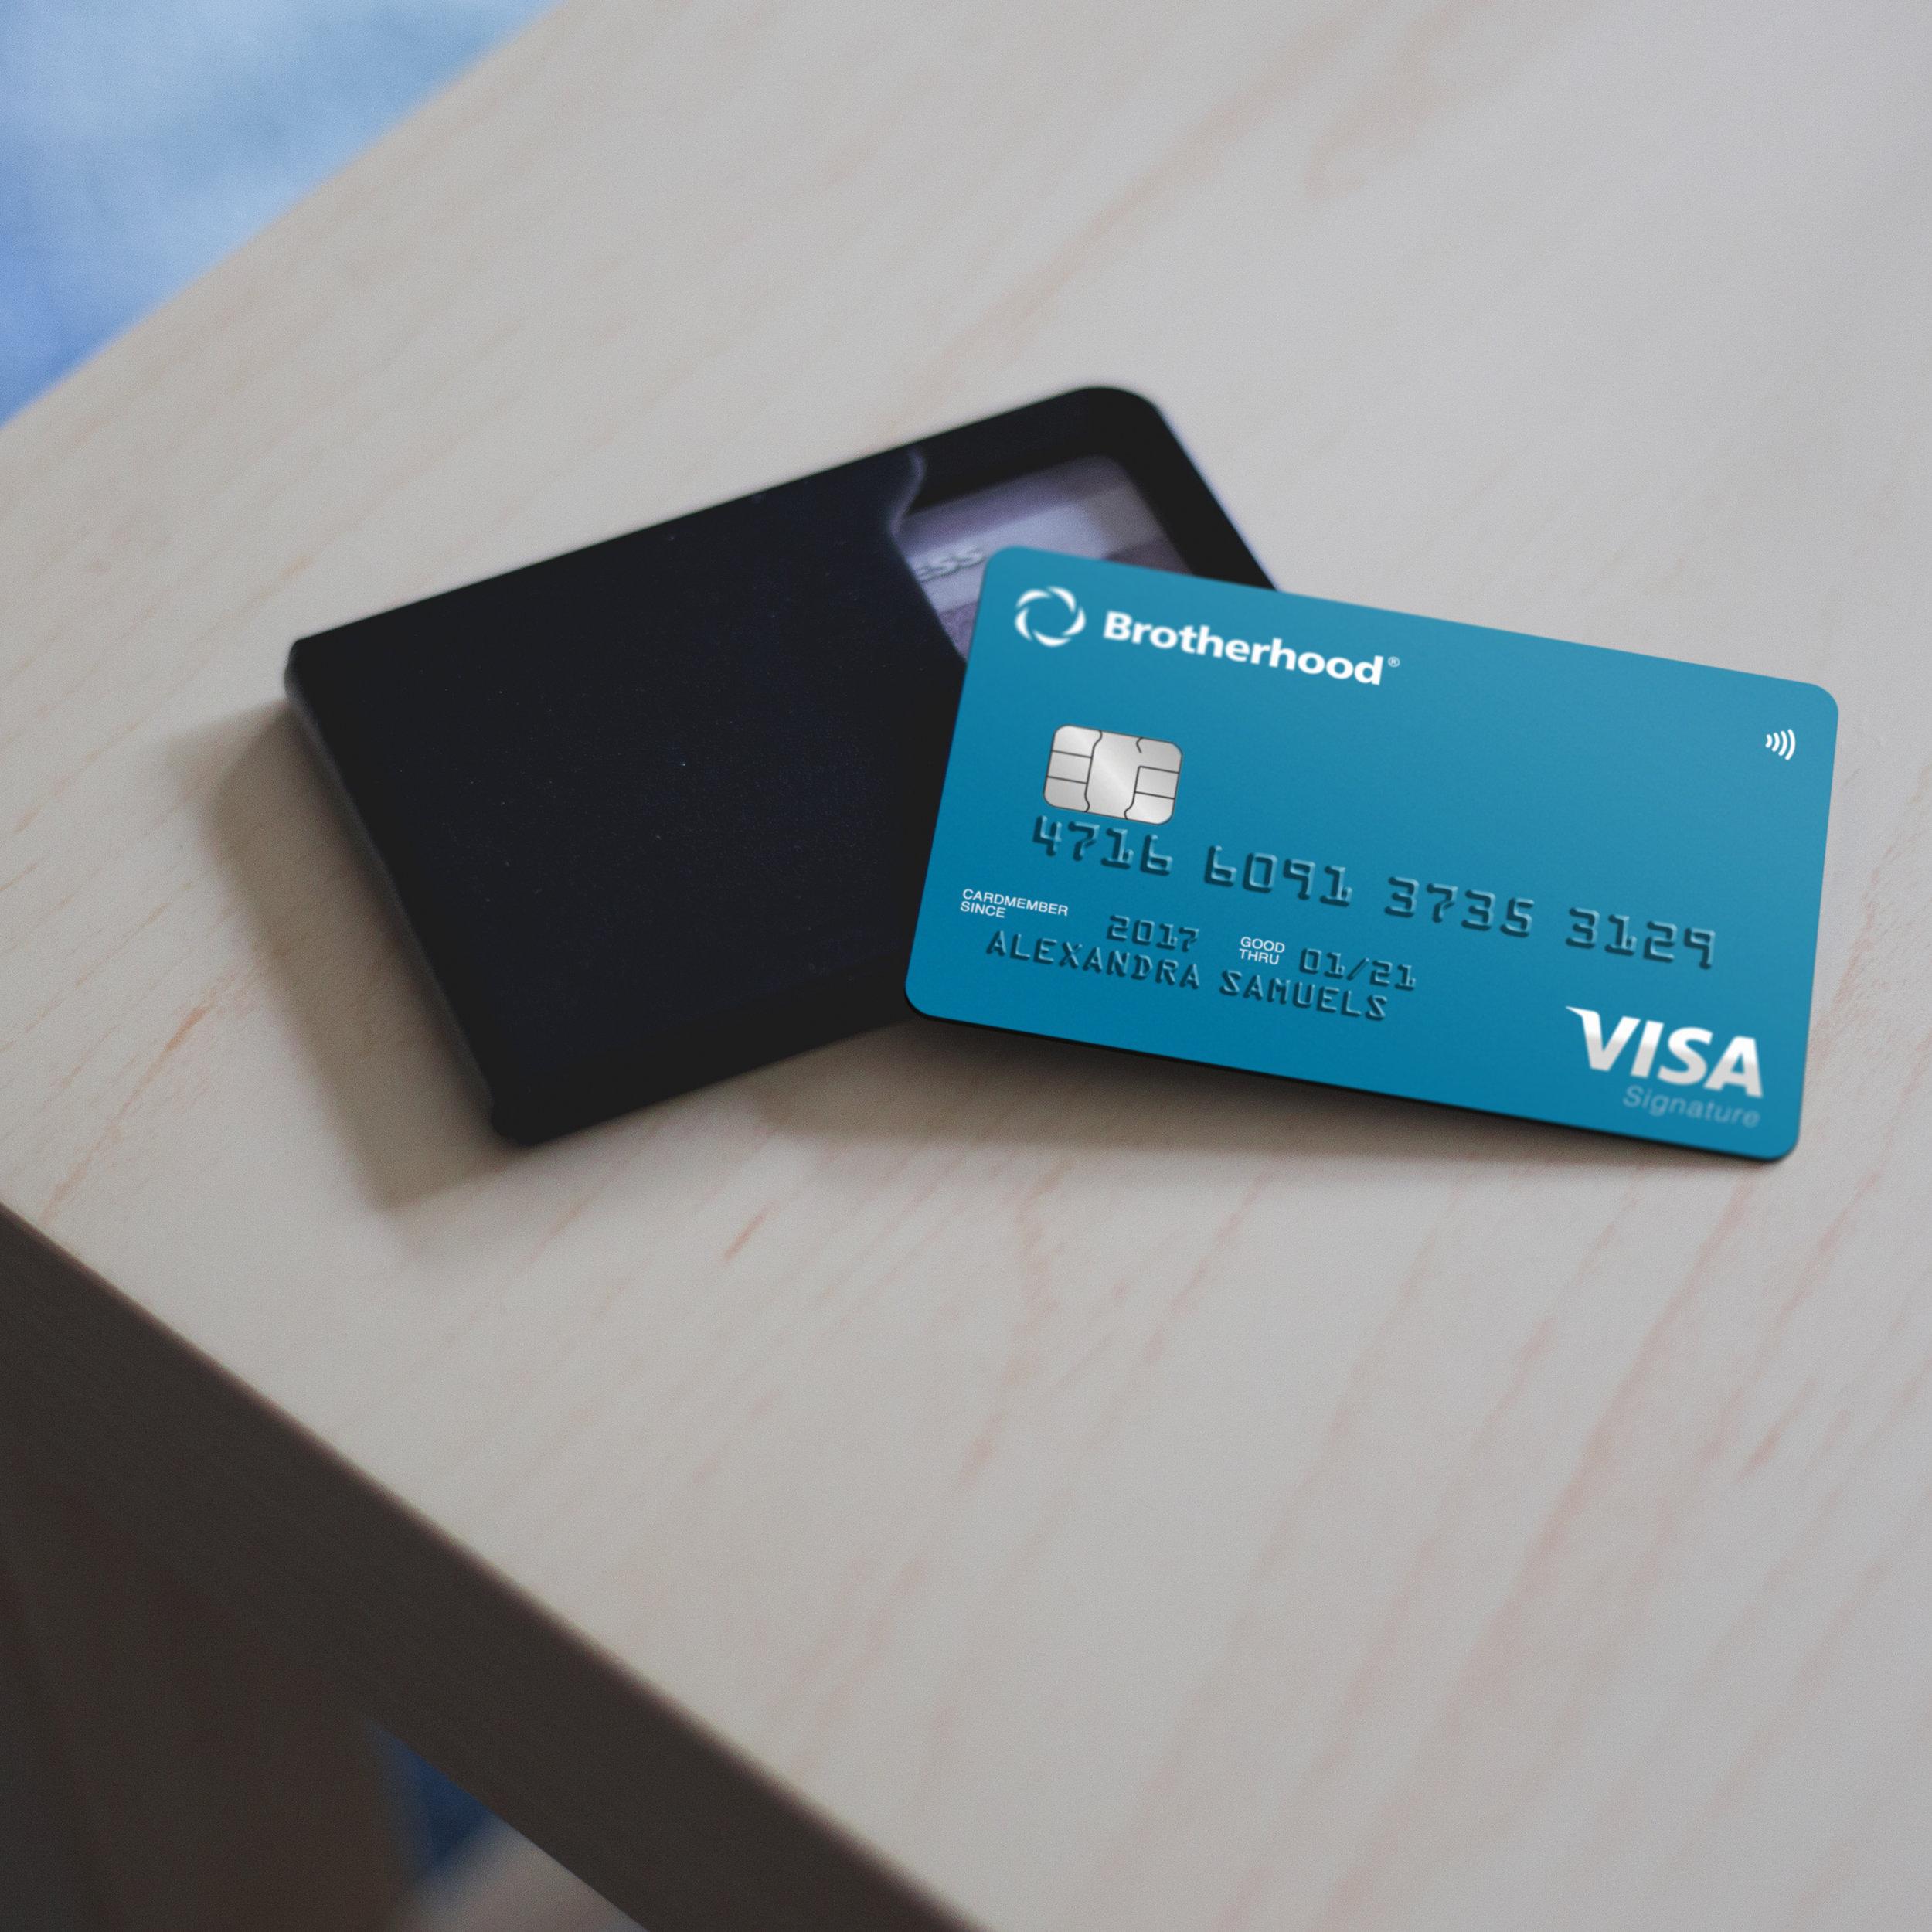 brotherhood_blue_credit_card.jpg